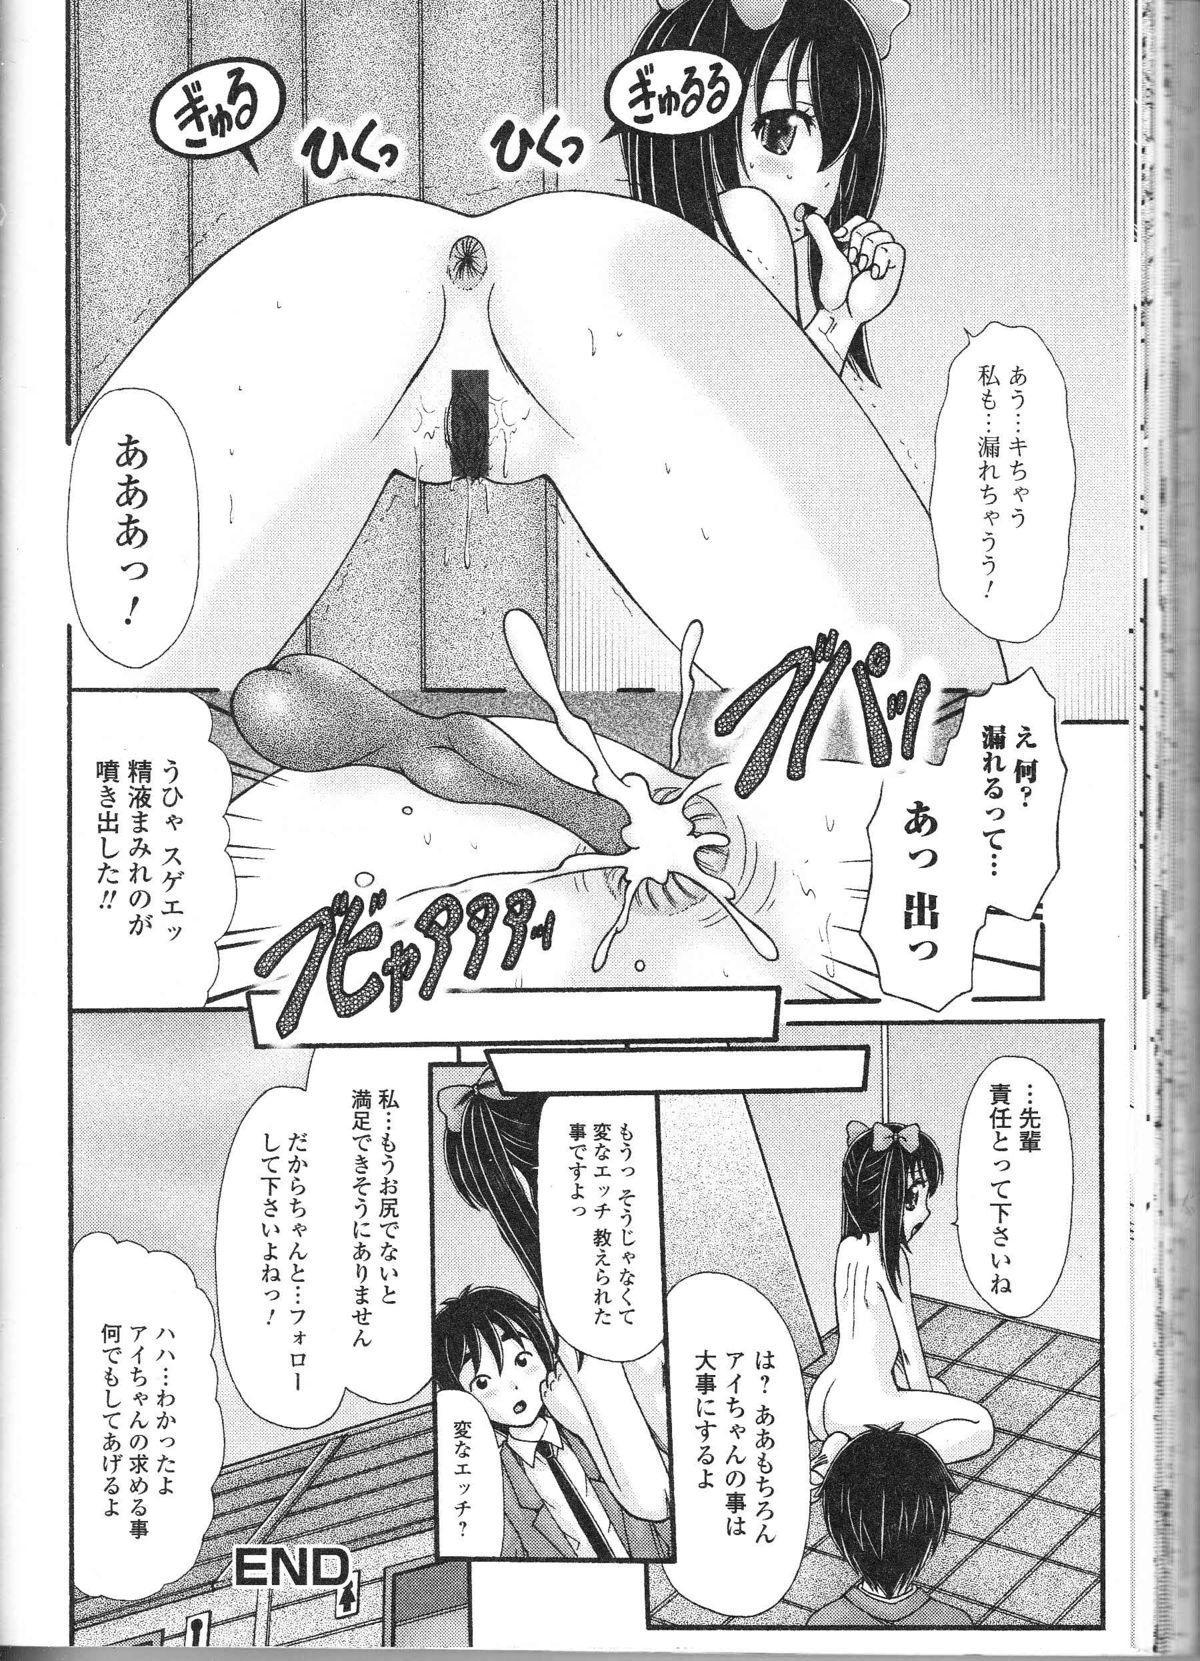 Nozoite wa Ikenai 9 - Do Not Peep! 9 140